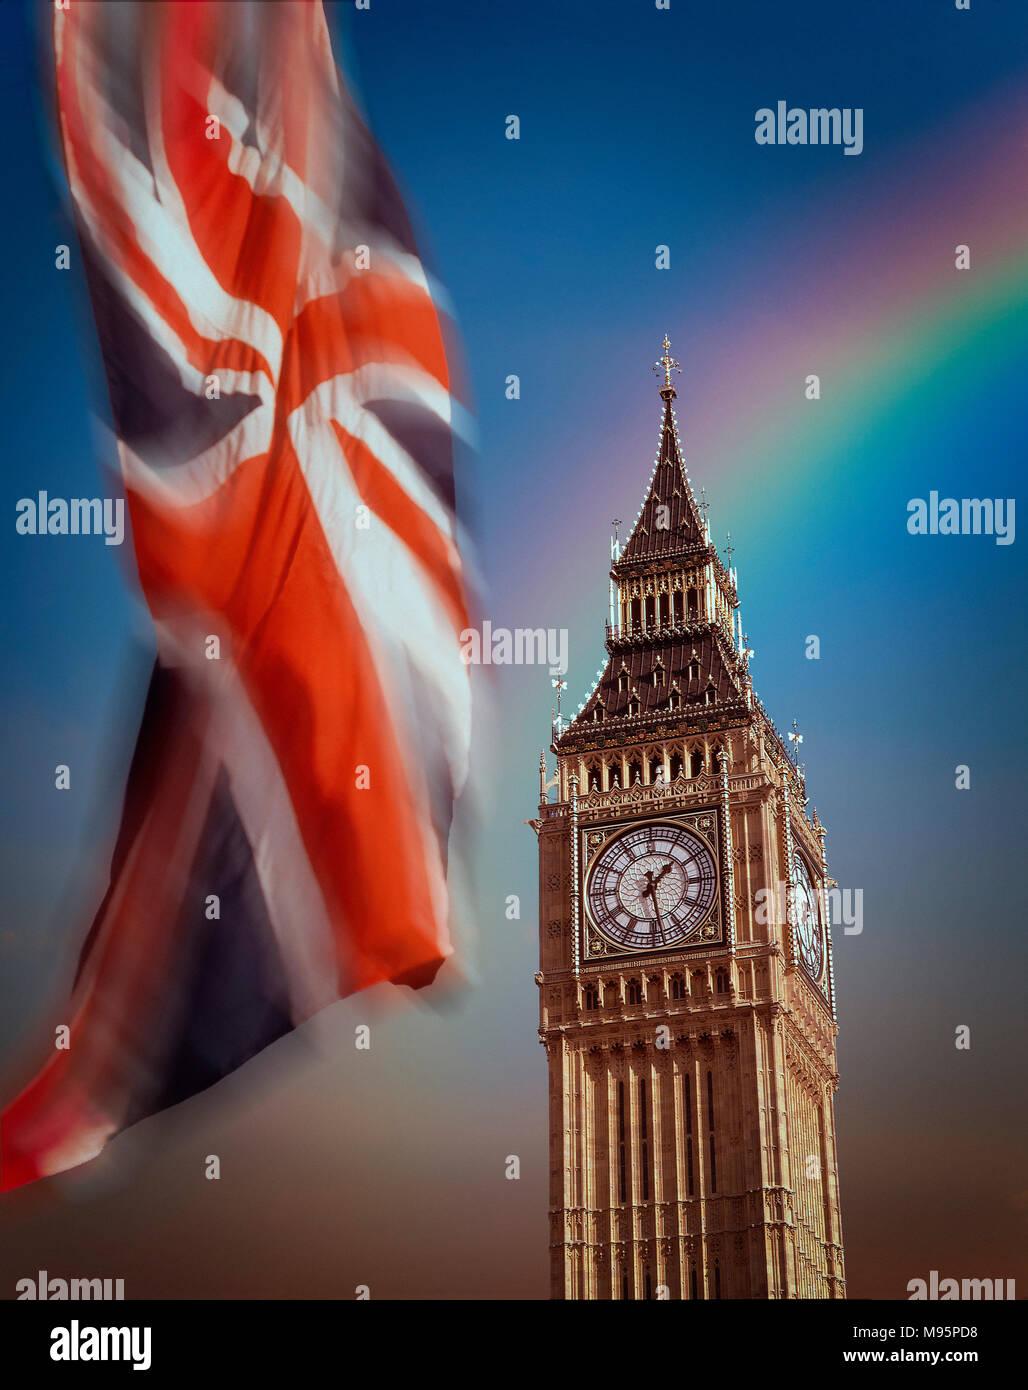 GB - LONDON: Big Ben (Elizabeth Tower) - Stock Image